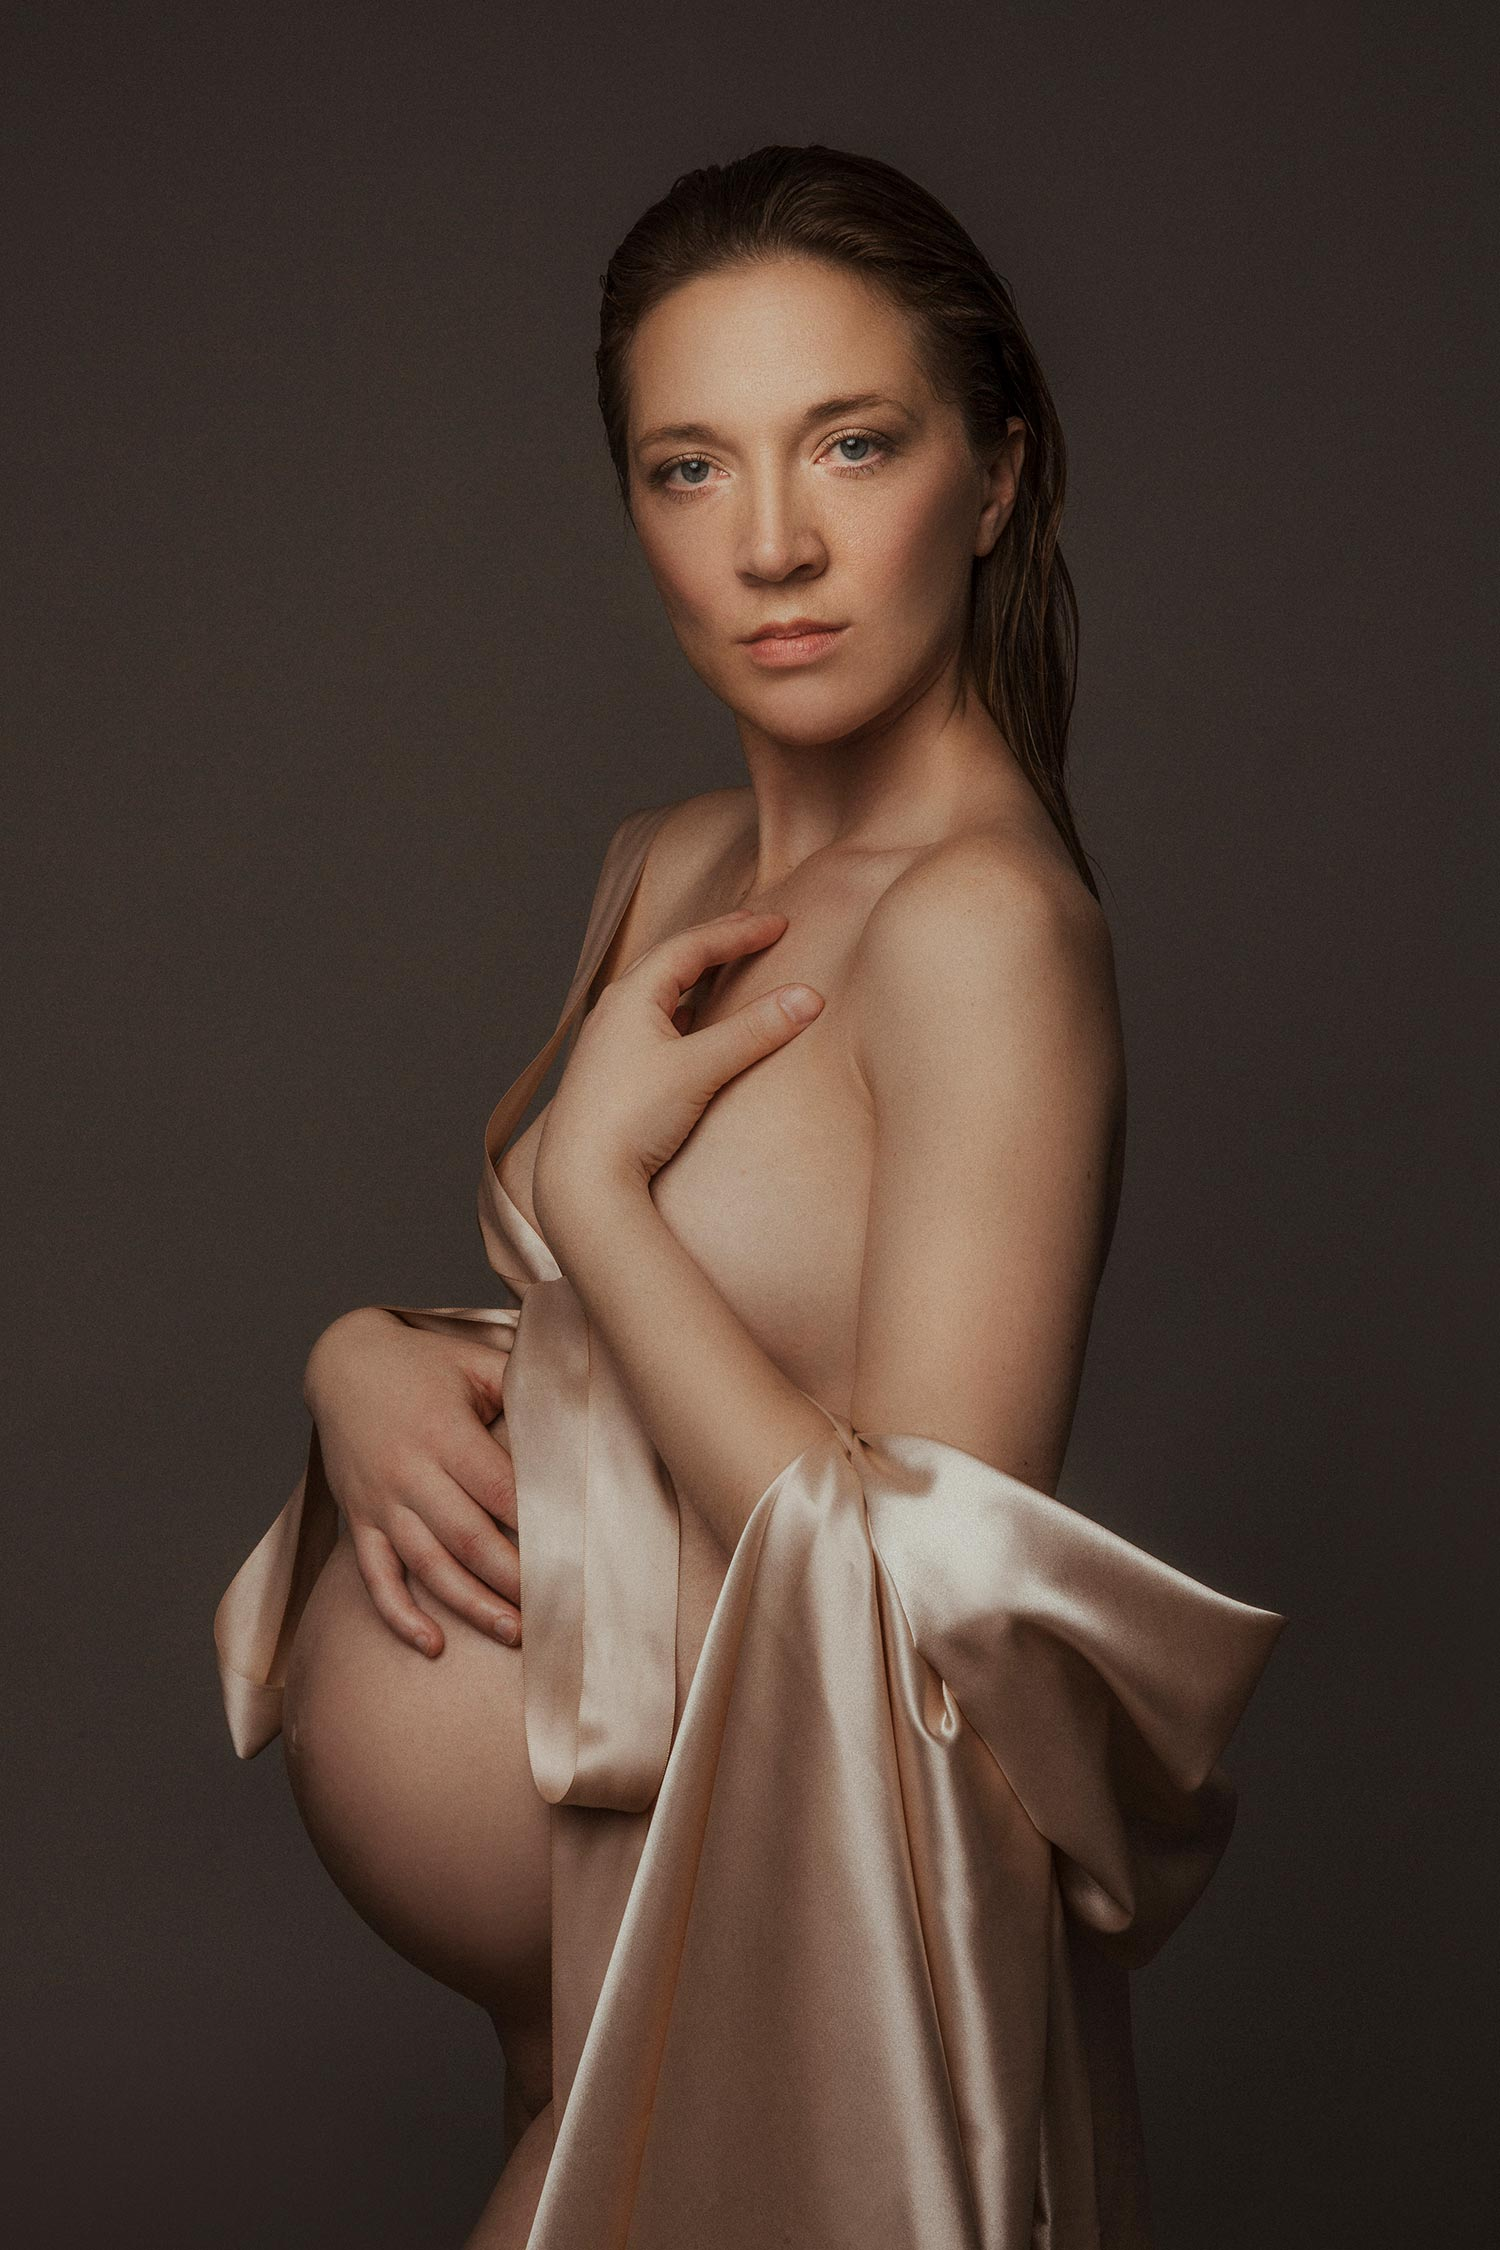 Maternity-Photographer-Thuy-Vo-06.jpg